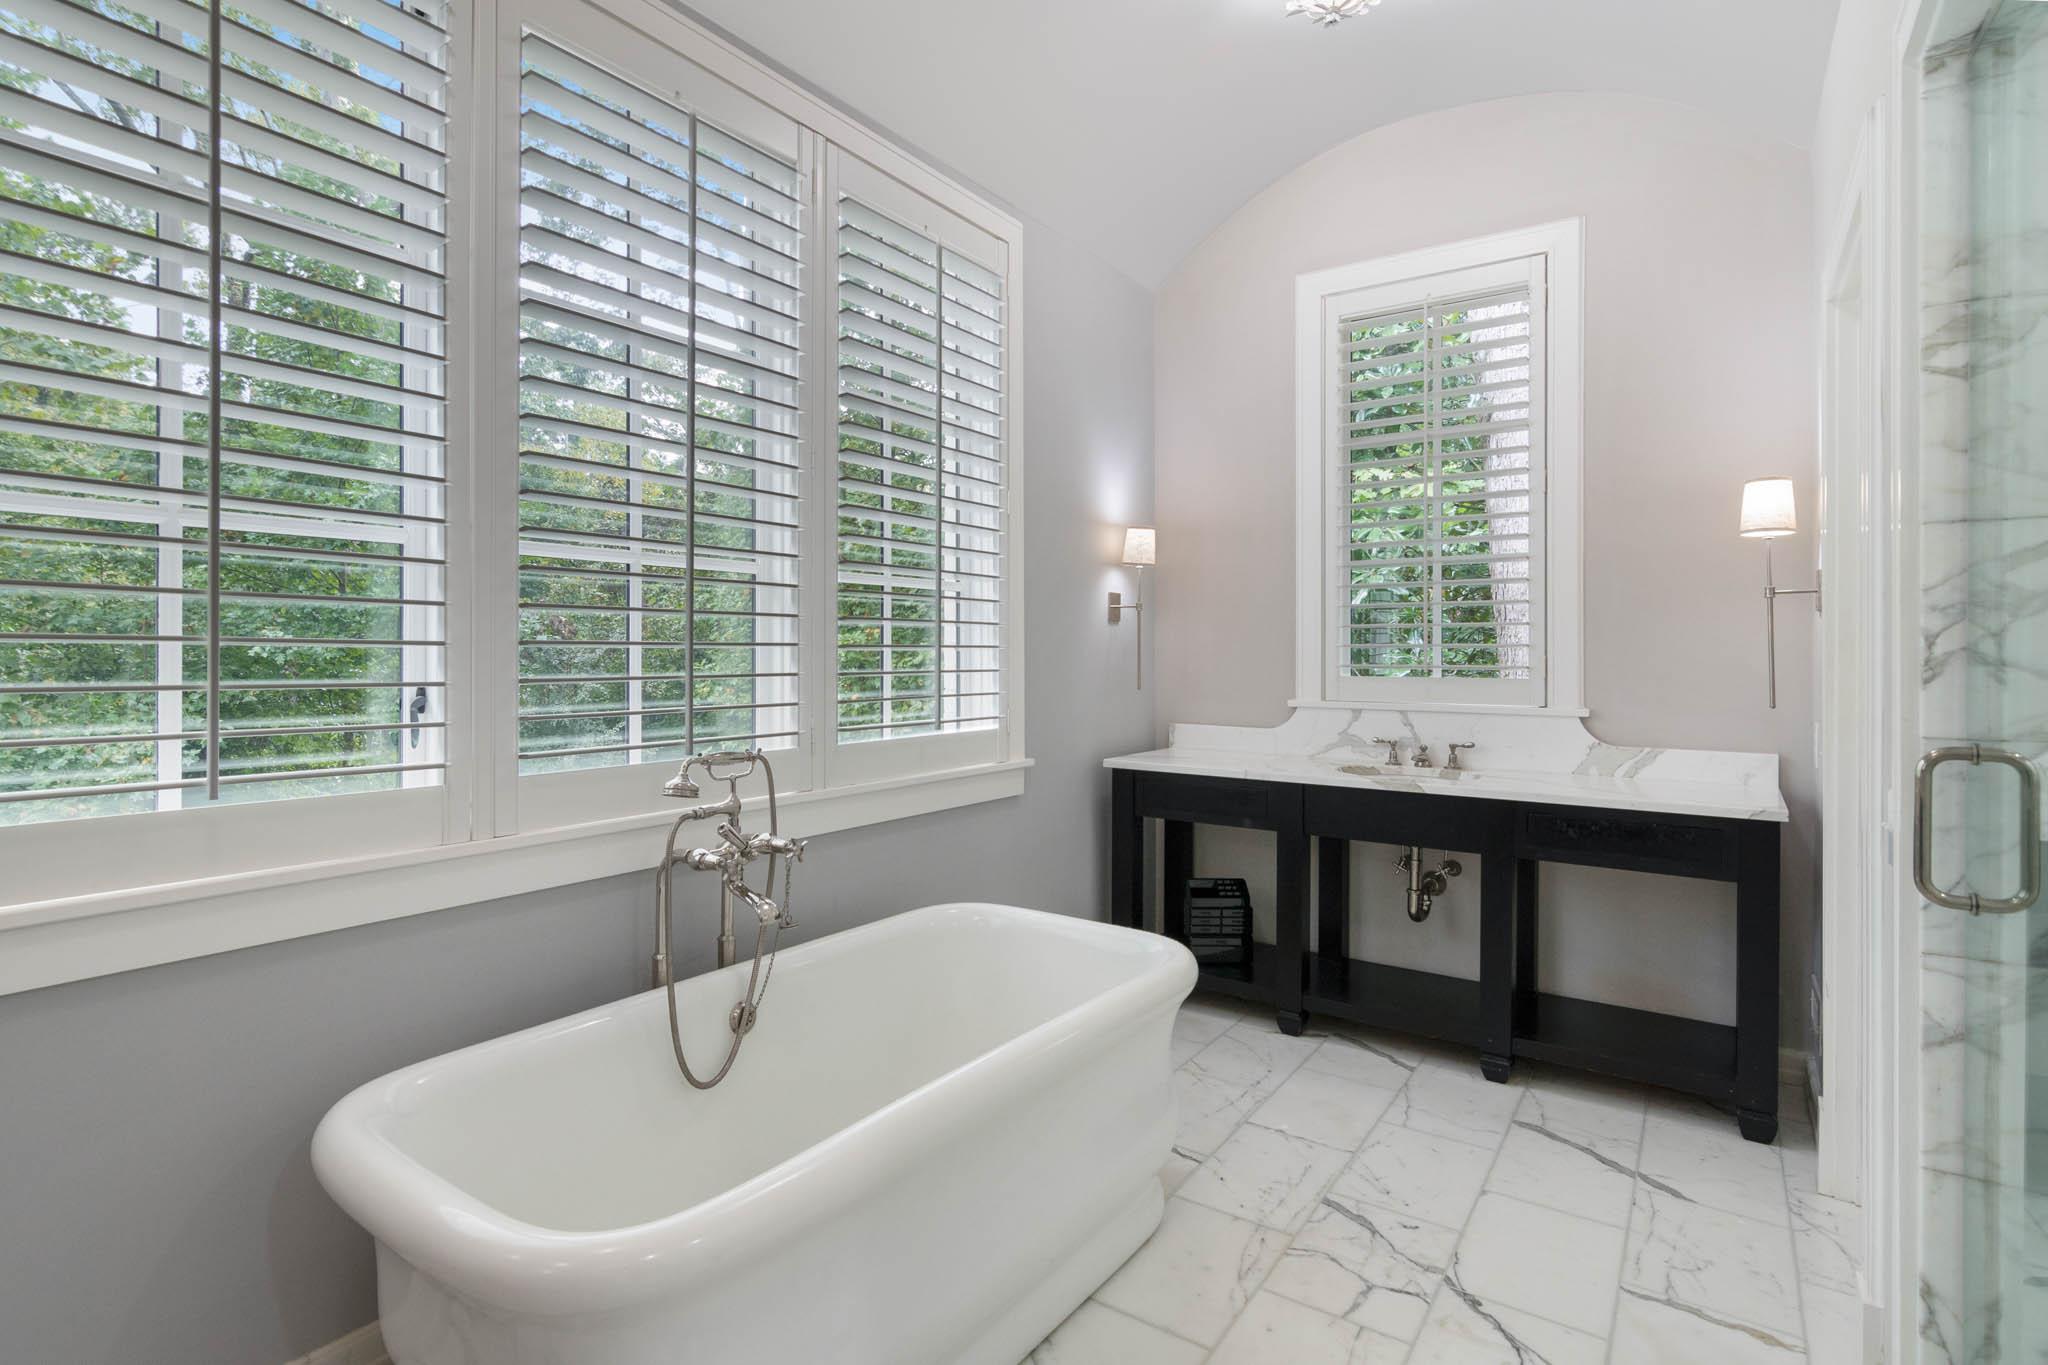 real_estate_photographer_bathroom_photography-10.jpg